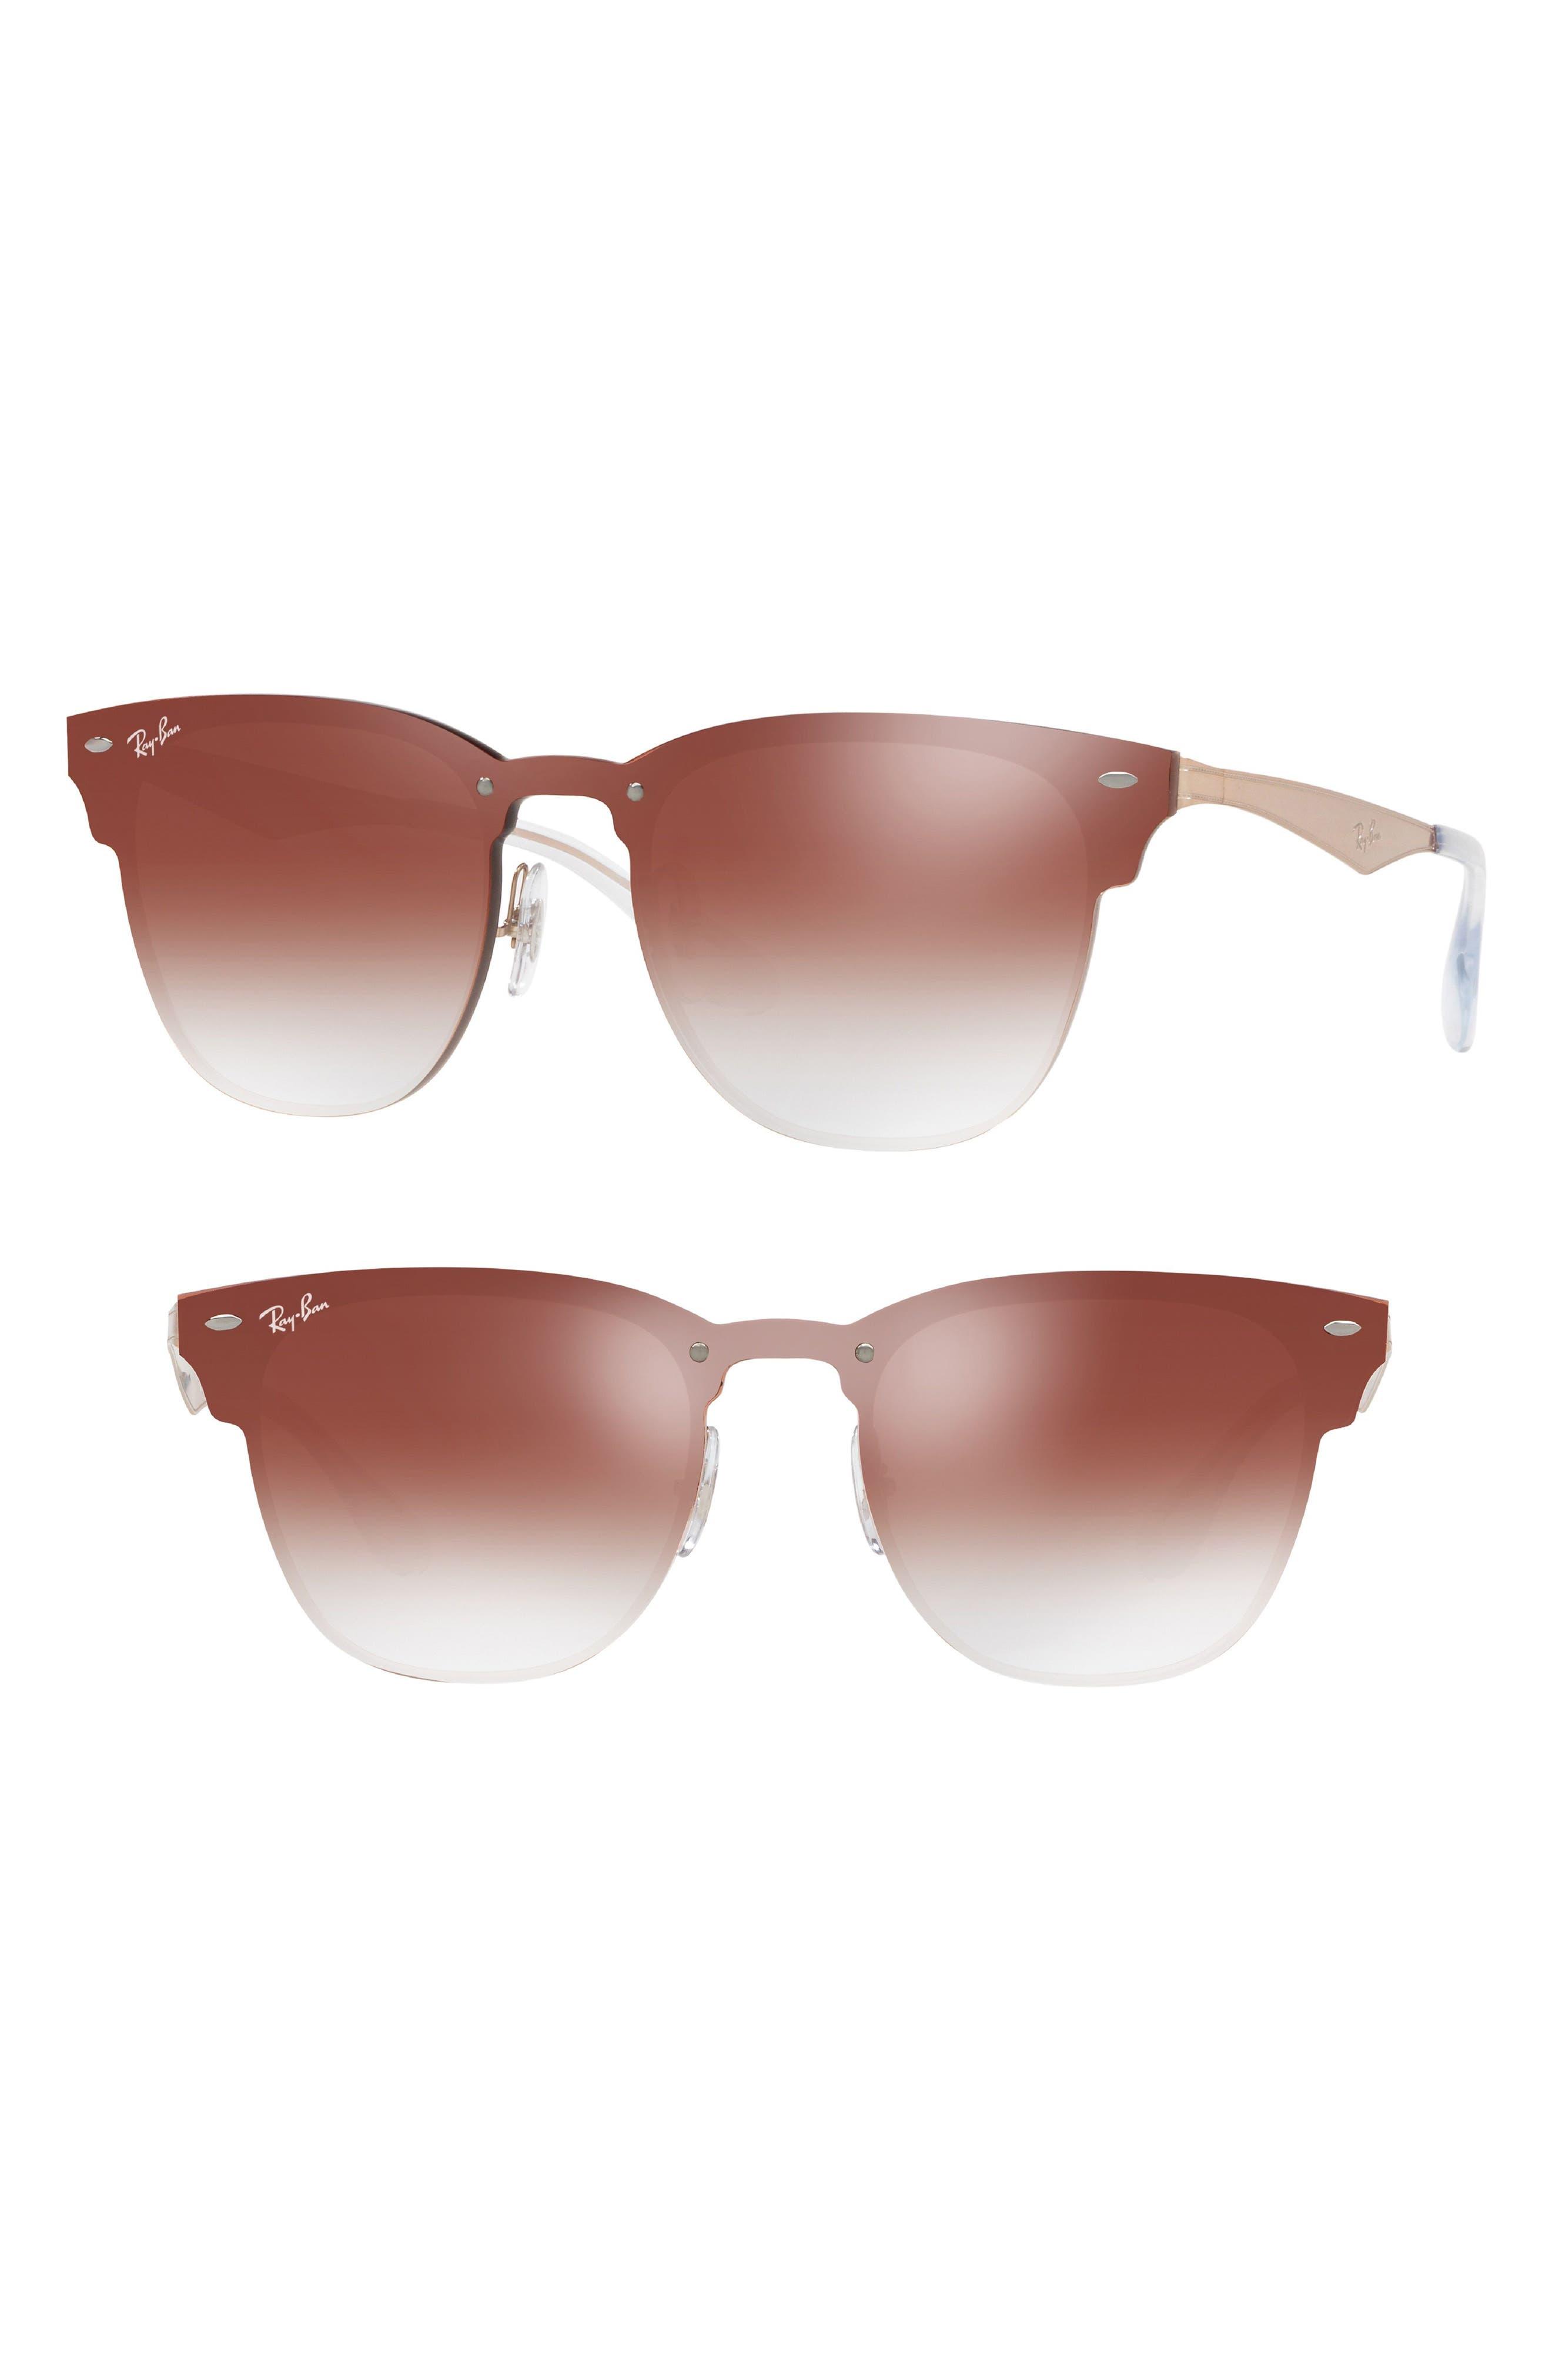 Blaze Clubmaster 47mm Sunglasses,                             Main thumbnail 1, color,                             221